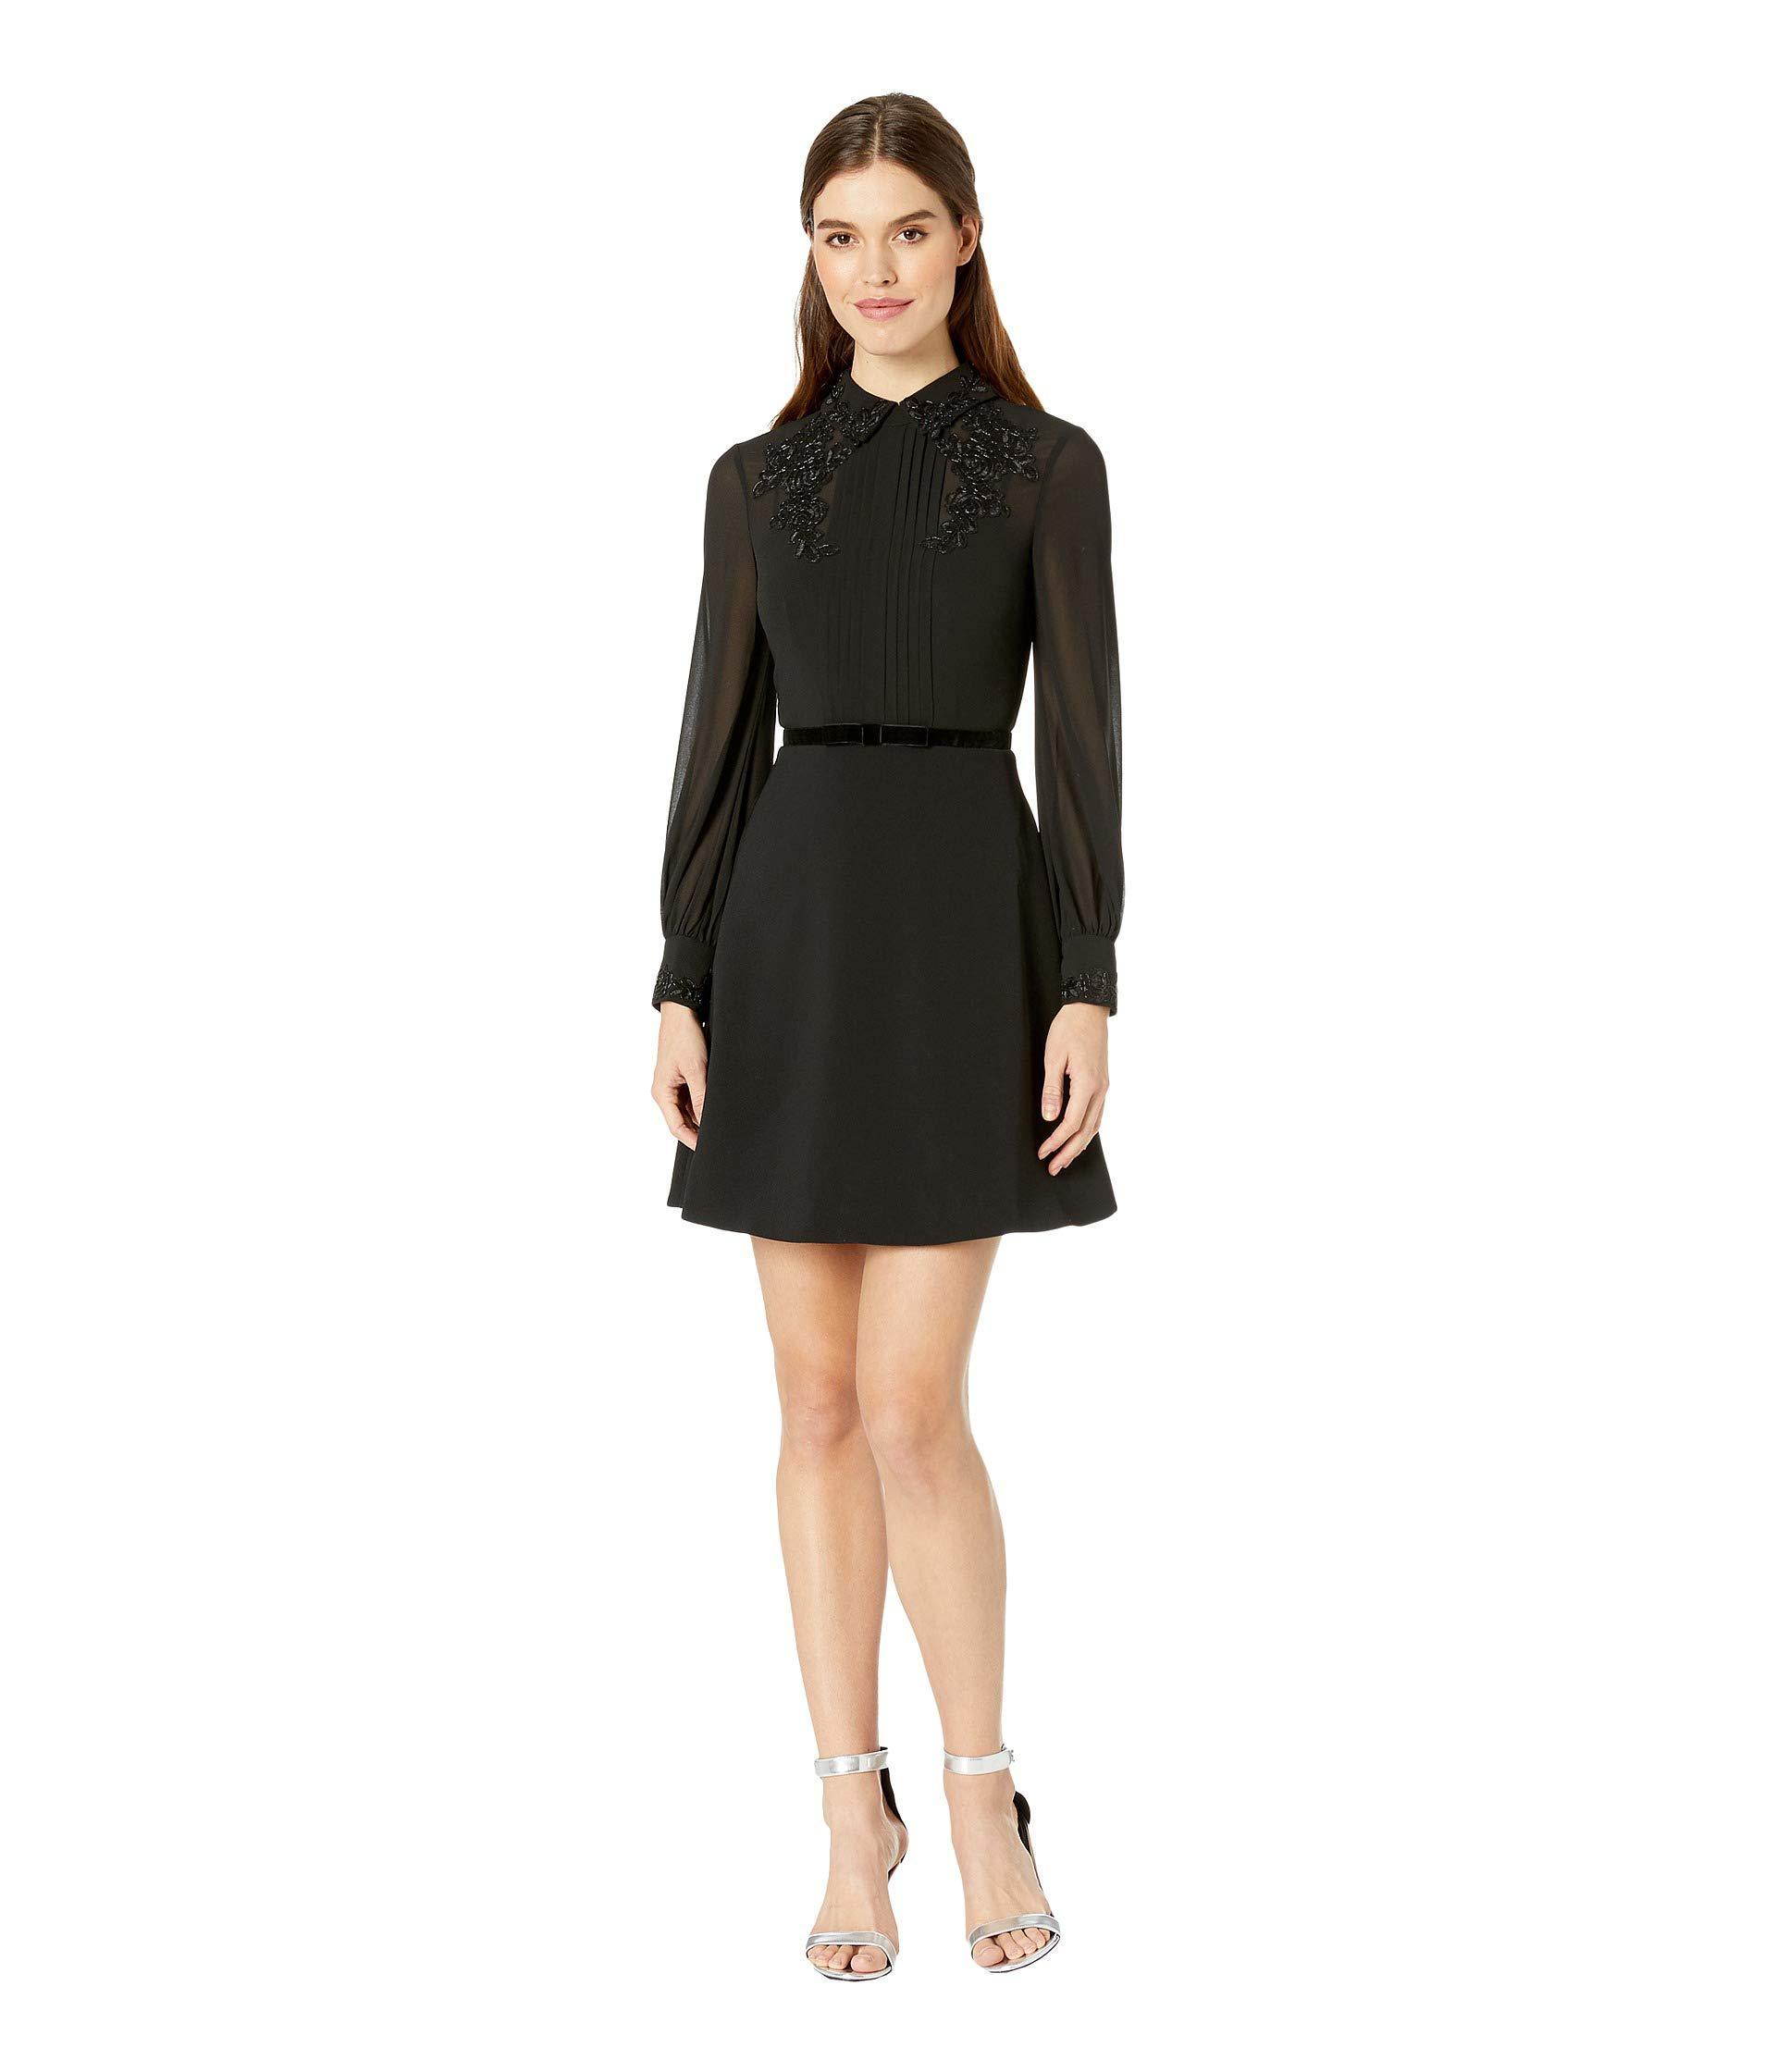 0af2bd12d445 Ted Baker - Amaali Lace Applique Tunic Dress (black) Women s Dress - Lyst.  View fullscreen